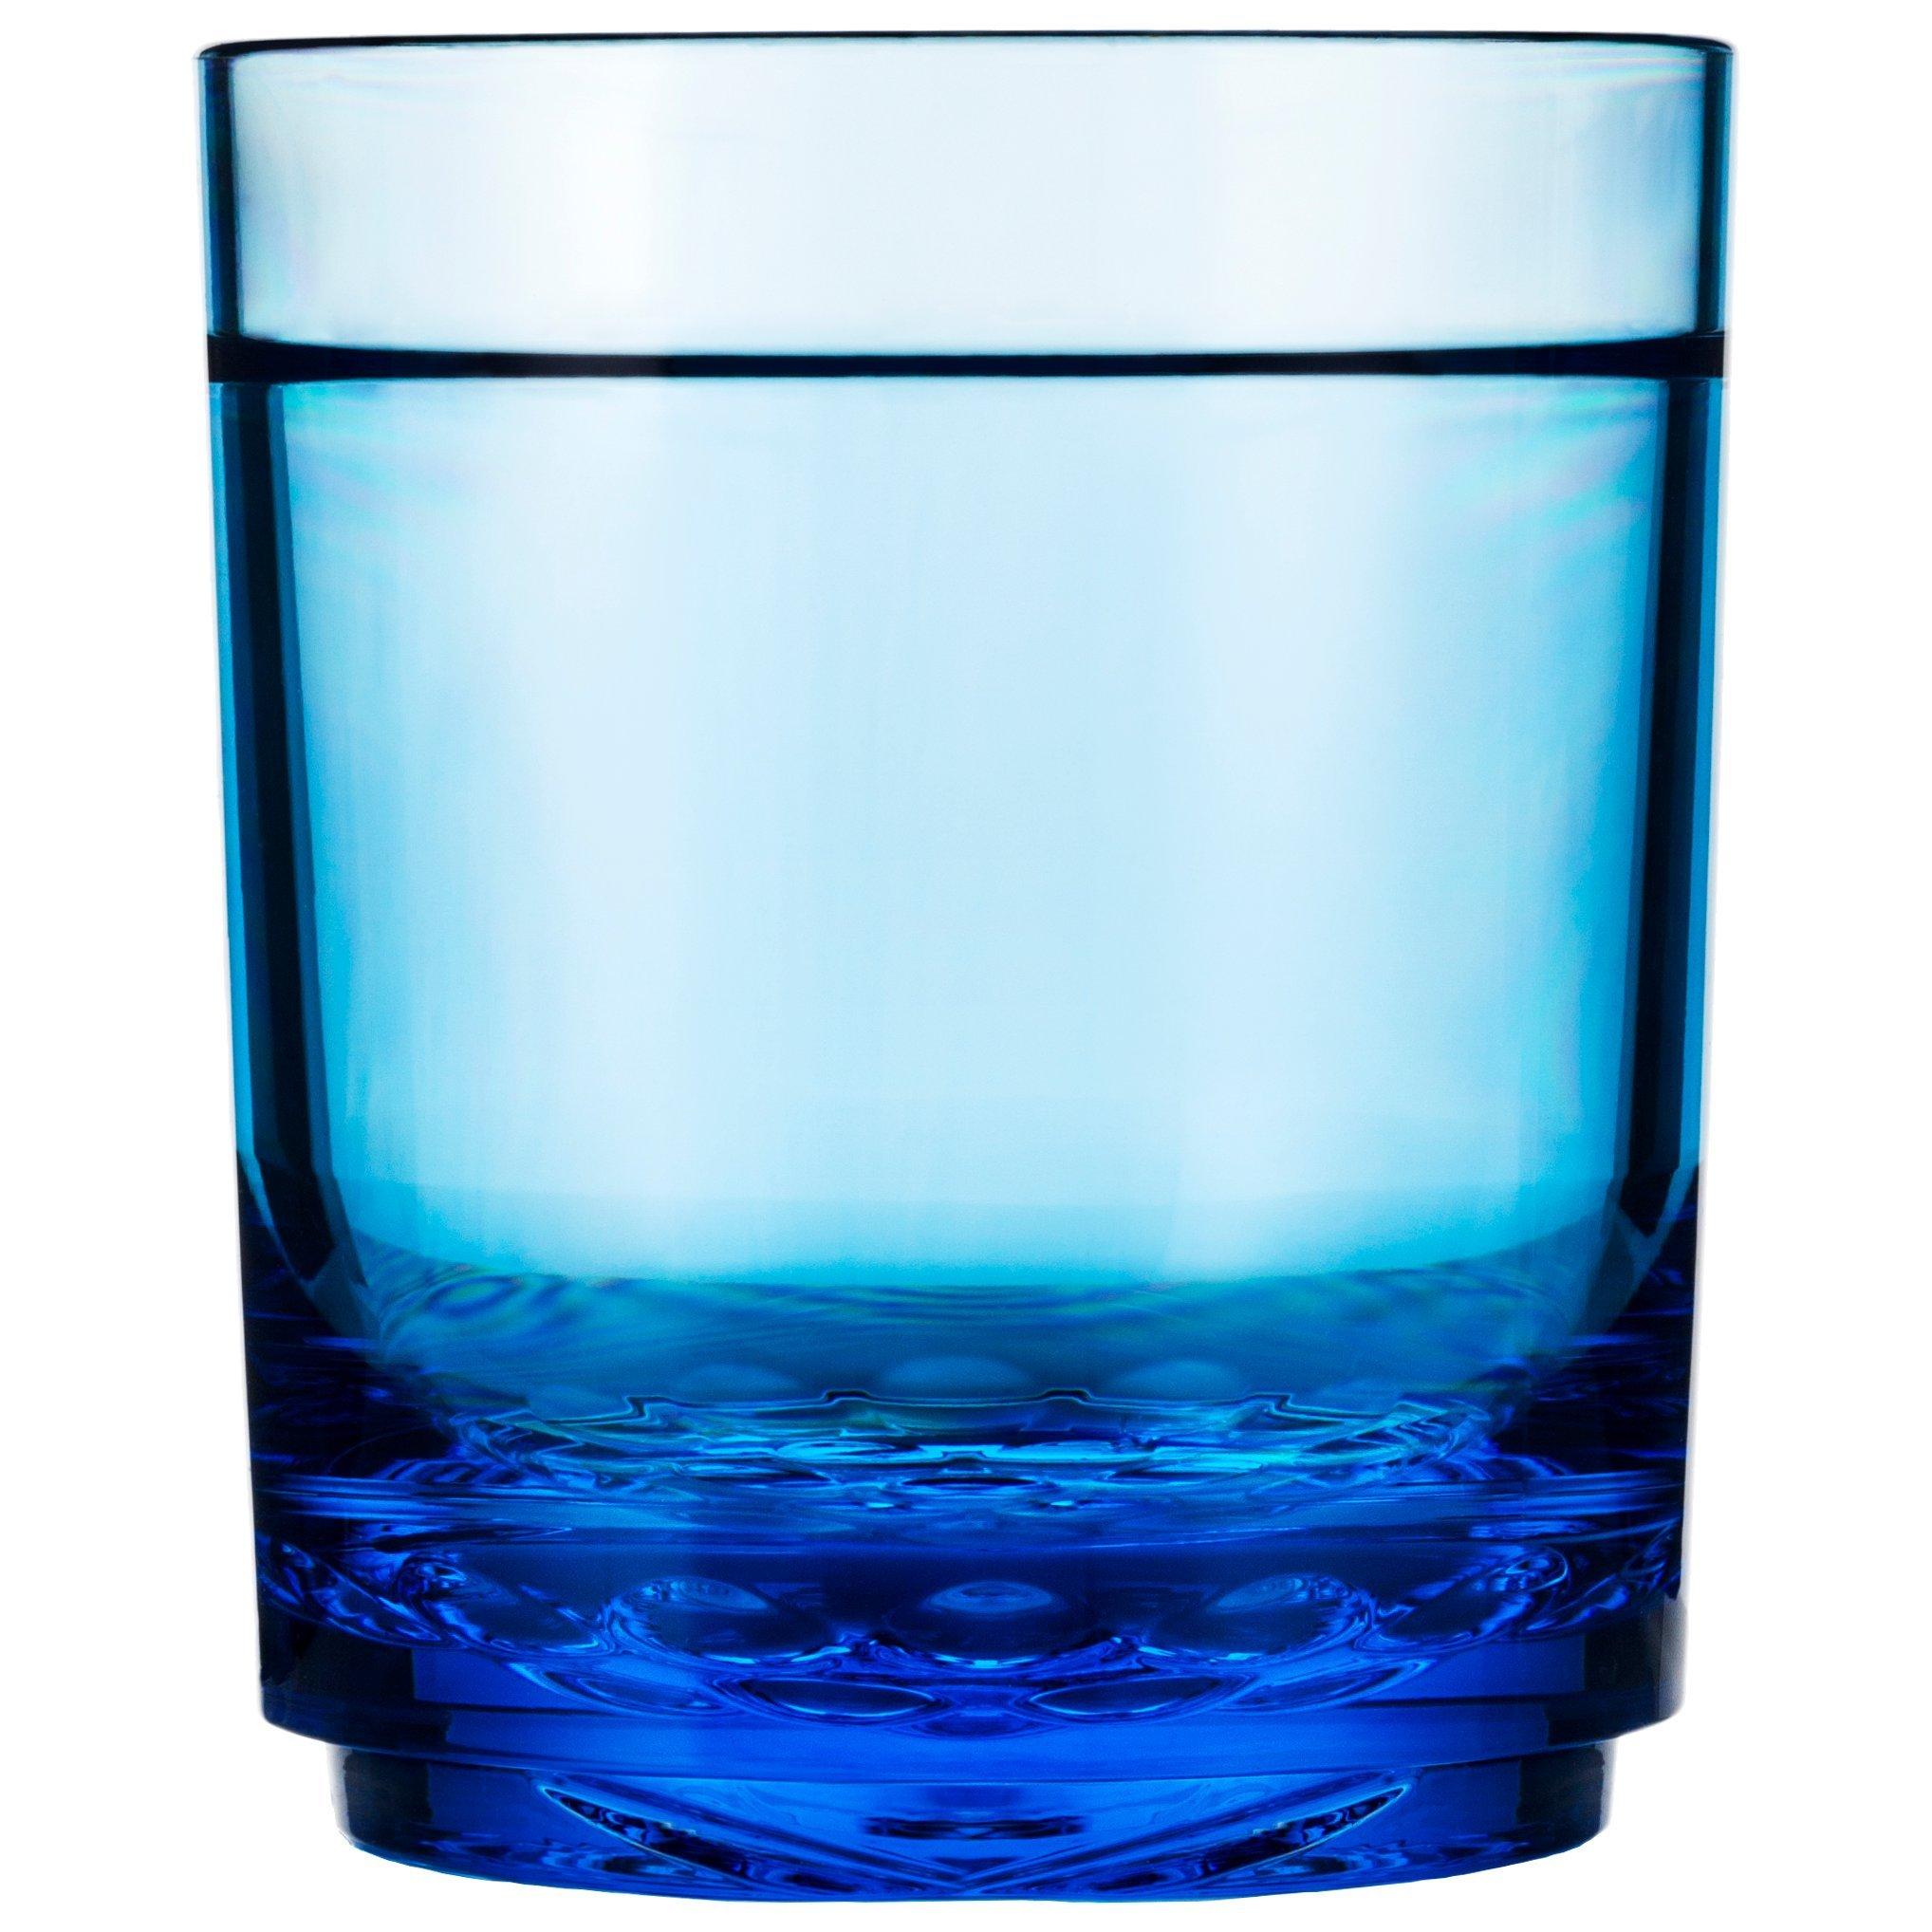 Drinique ELT-TU-BLU-4 Elite Tumbler Unbreakable Tritan Drinking Glasses, 12 oz (Set of 4), Blue